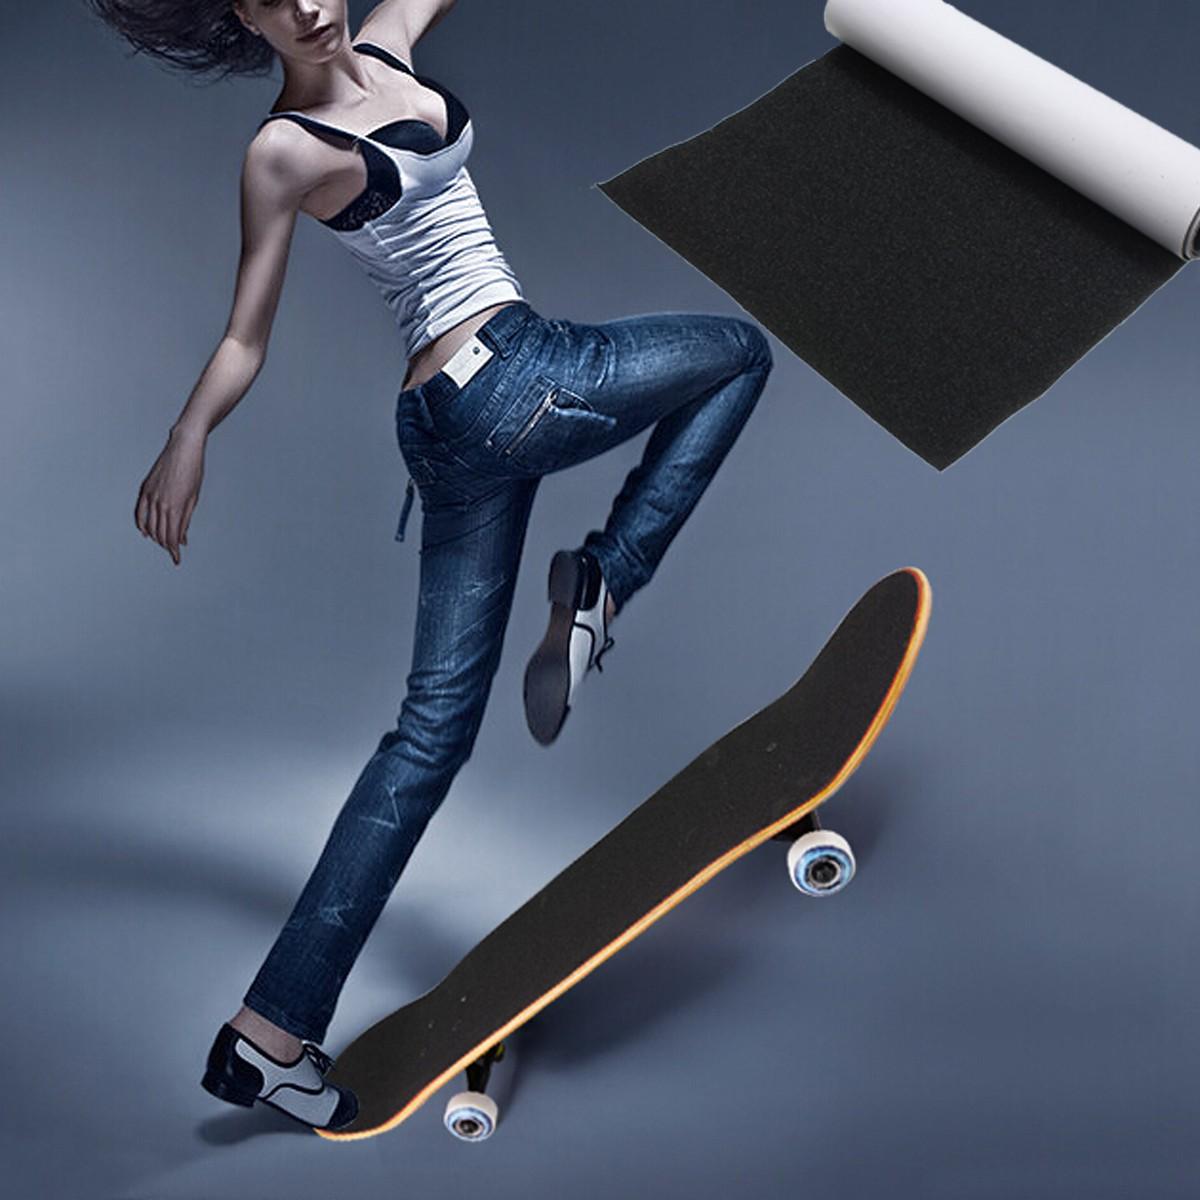 perforated grip tape sand paper skateboard skate scooter sticker 81 cm 22 cm lazada singapore. Black Bedroom Furniture Sets. Home Design Ideas